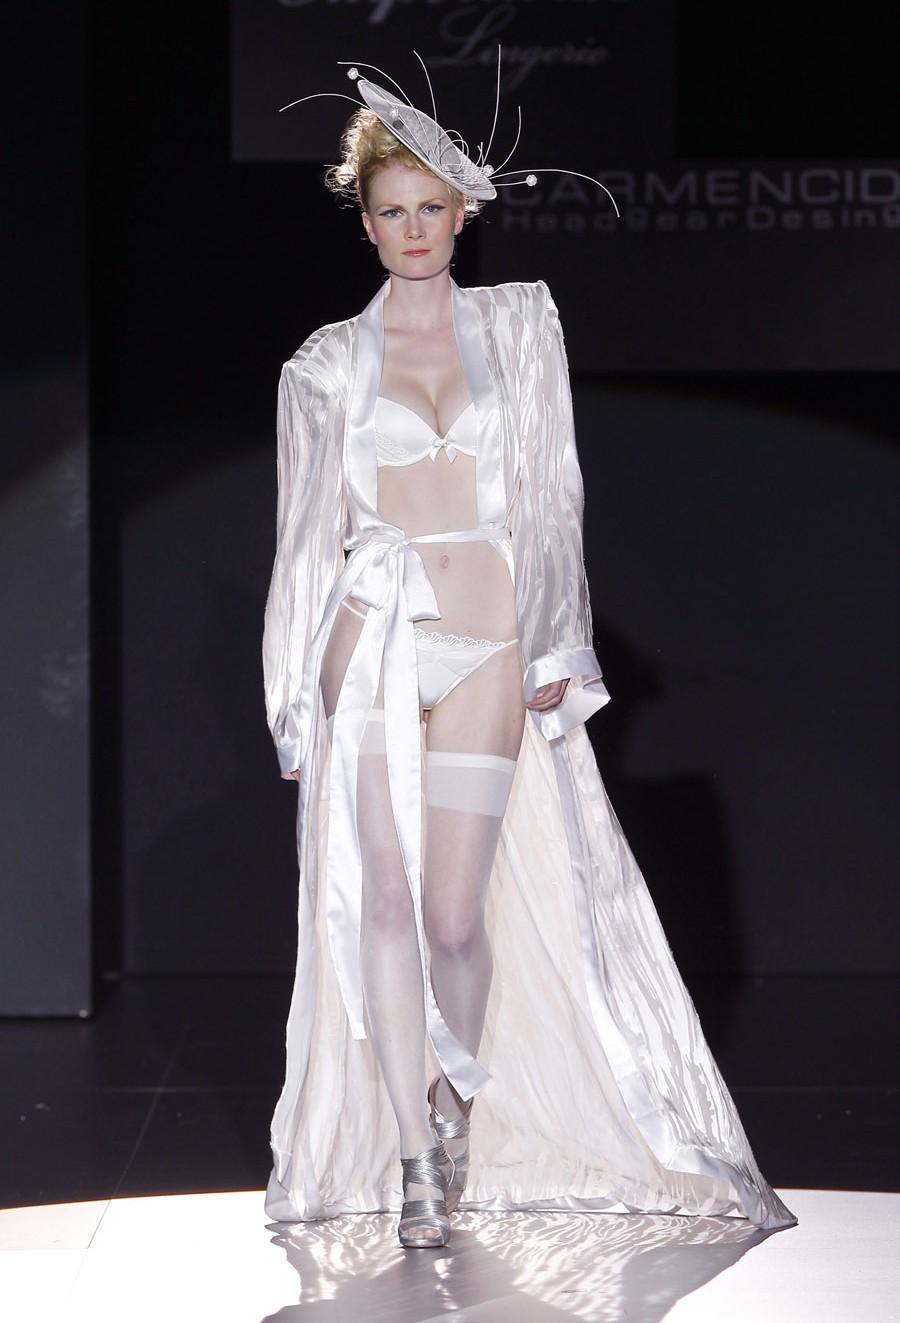 69 Crazy Wedding Dress Ideas